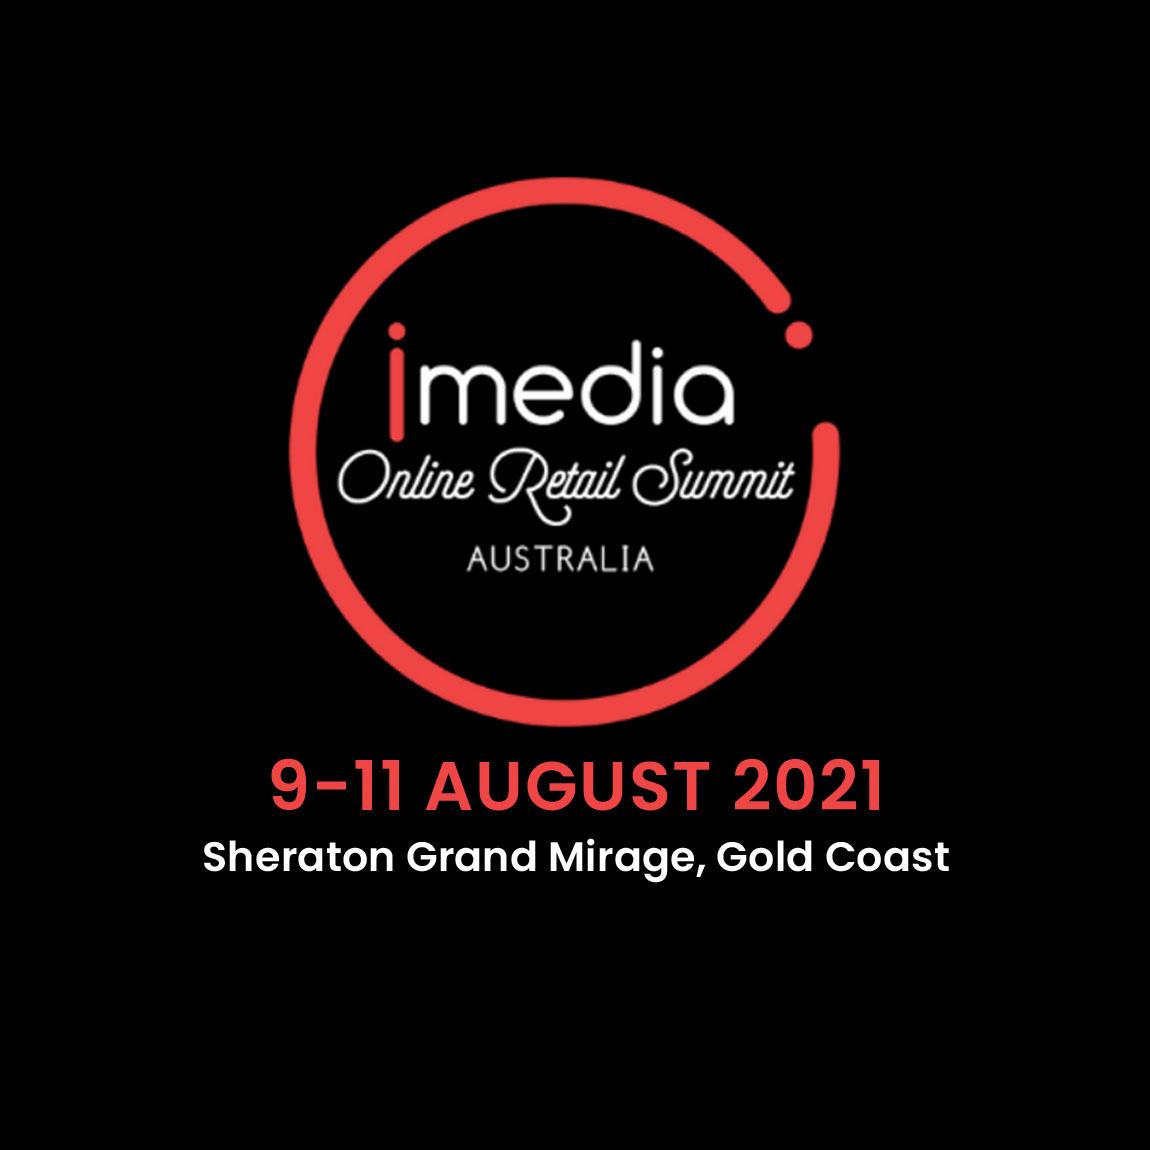 iMedia Online Retail Summit Australia